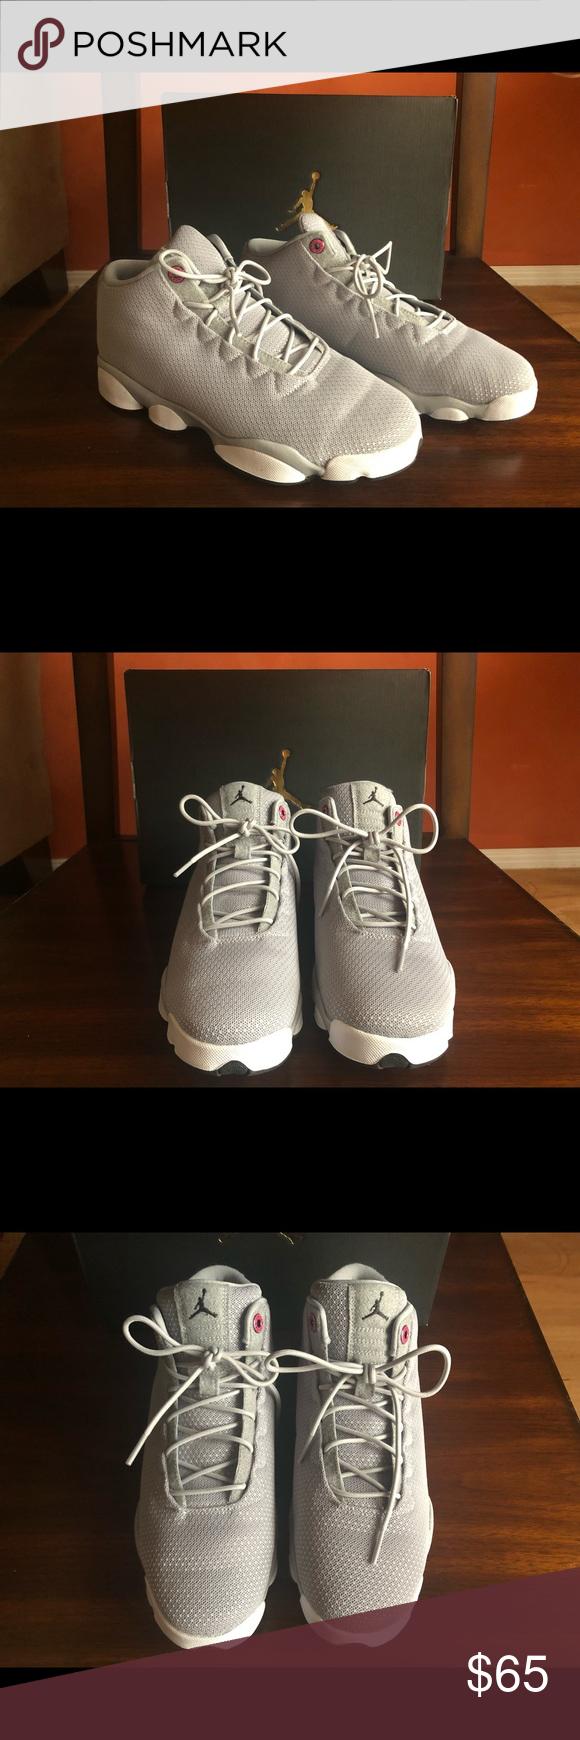 GIRLS Jordan Horizon Low Size 7Y Womens Size 8.5 Excellent condition in box  GIRLS Jordan Horizon Low sneakers. Wolf grey d656220525